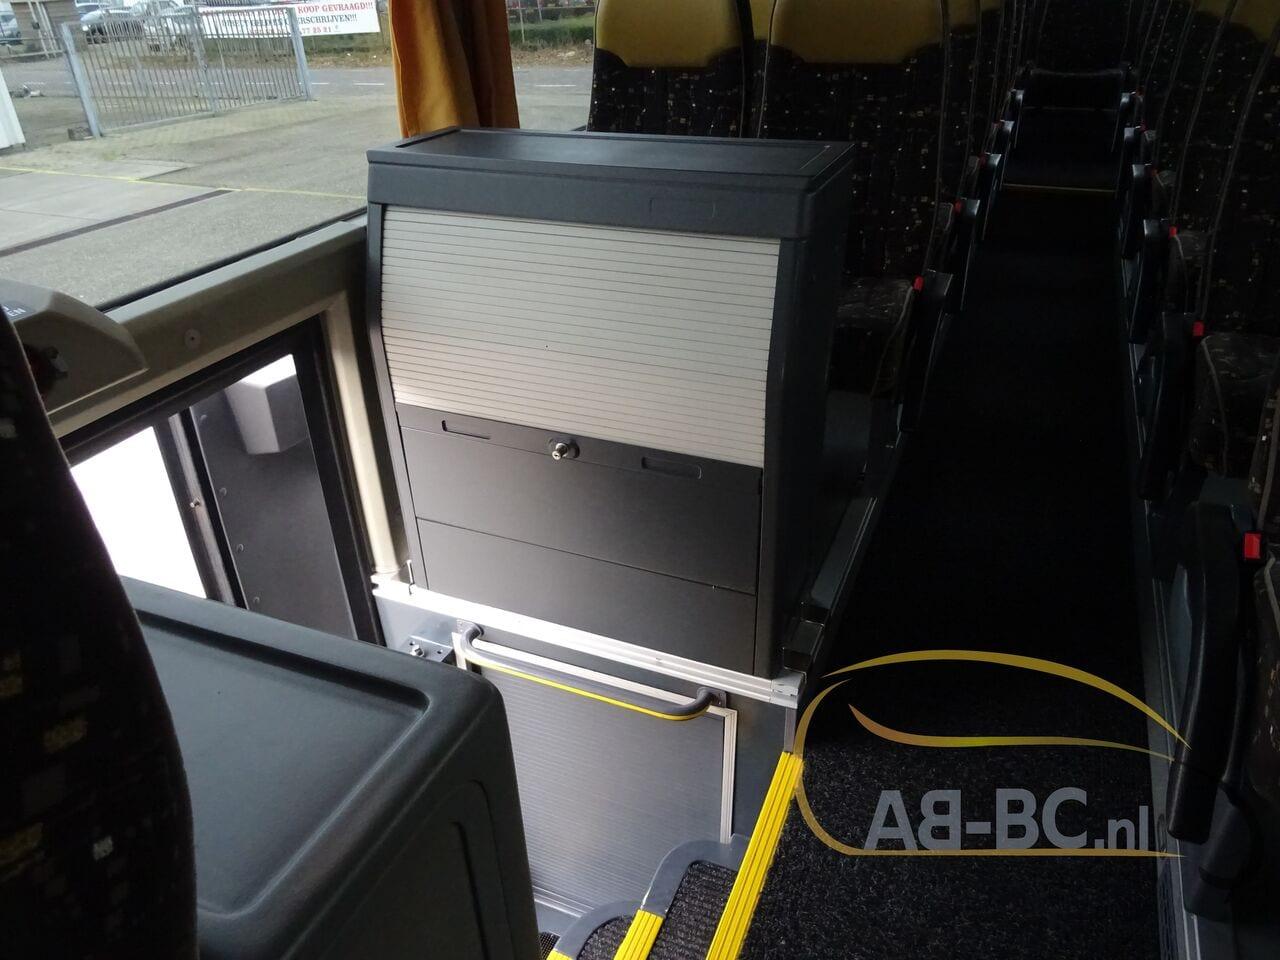 coach-busTEMSA-Safari-HD-51-Seats-EURO5-12-MTR---1614266622479895789_big_feddbb71949d4cc8c3c9ed62ae868c15--19052917224730818200